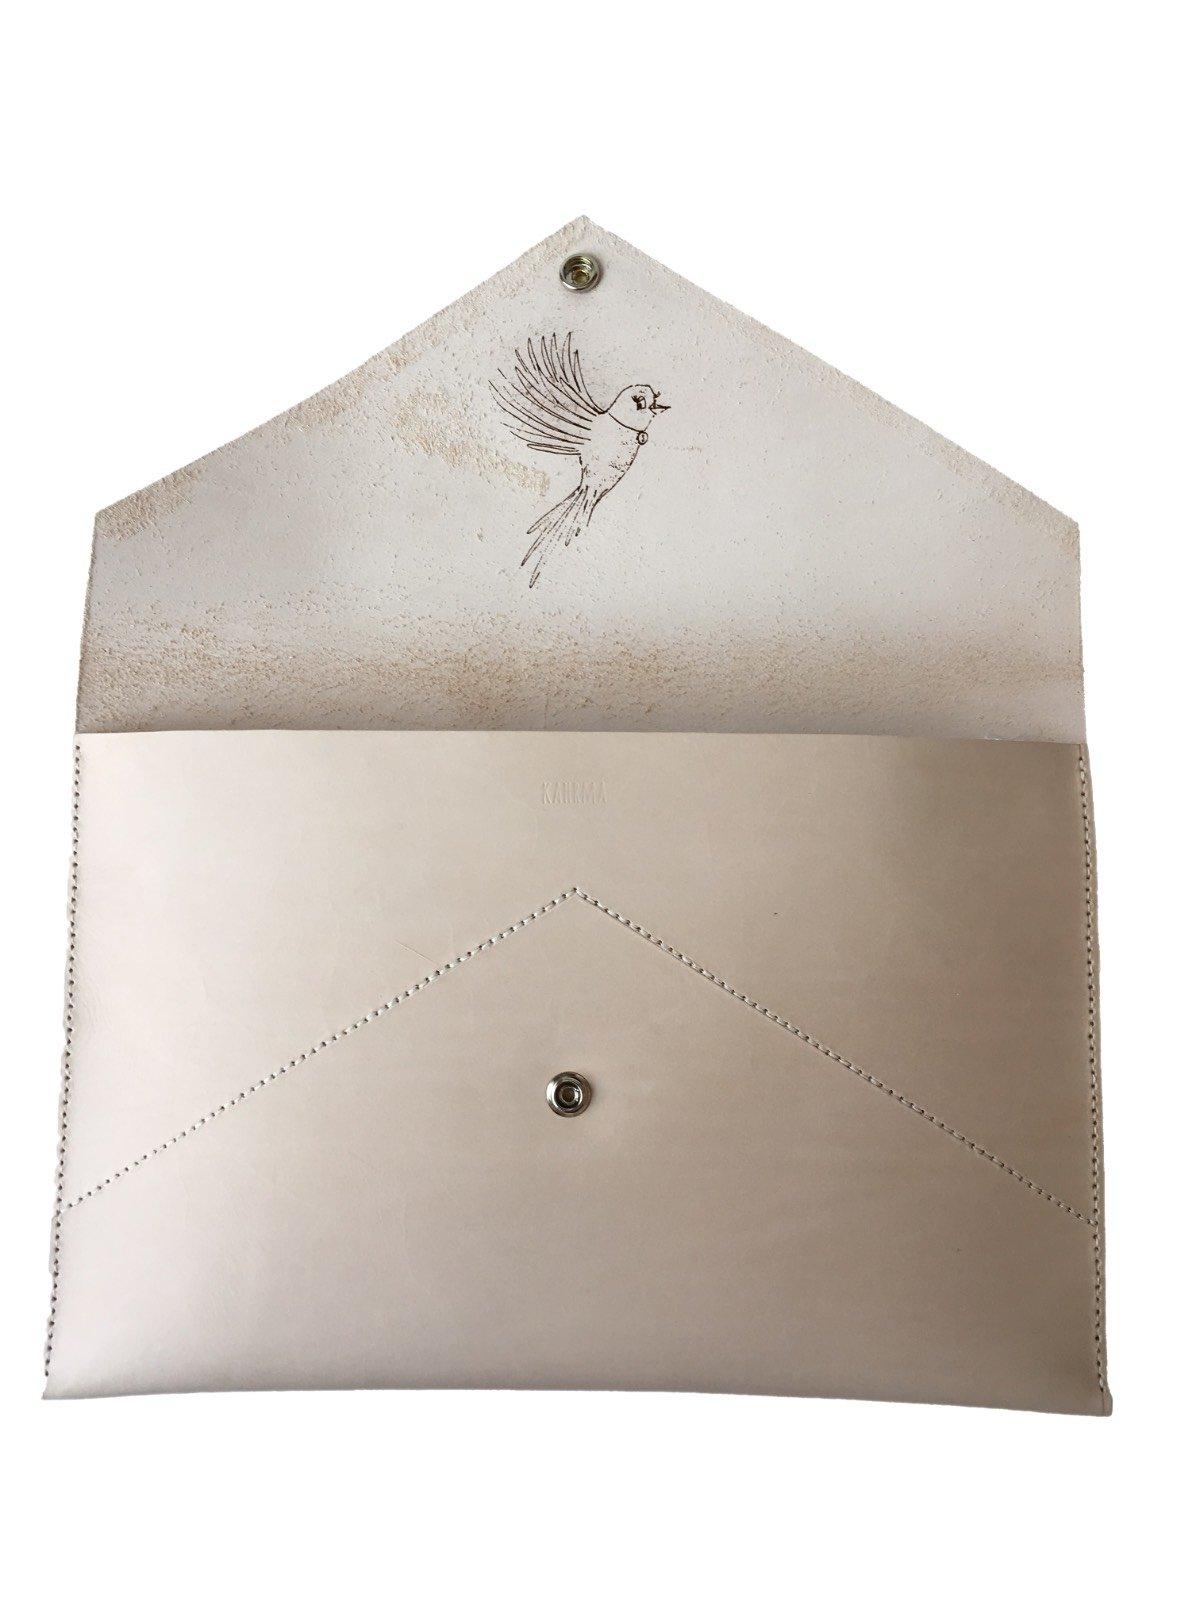 Notebooktasche aus Leder